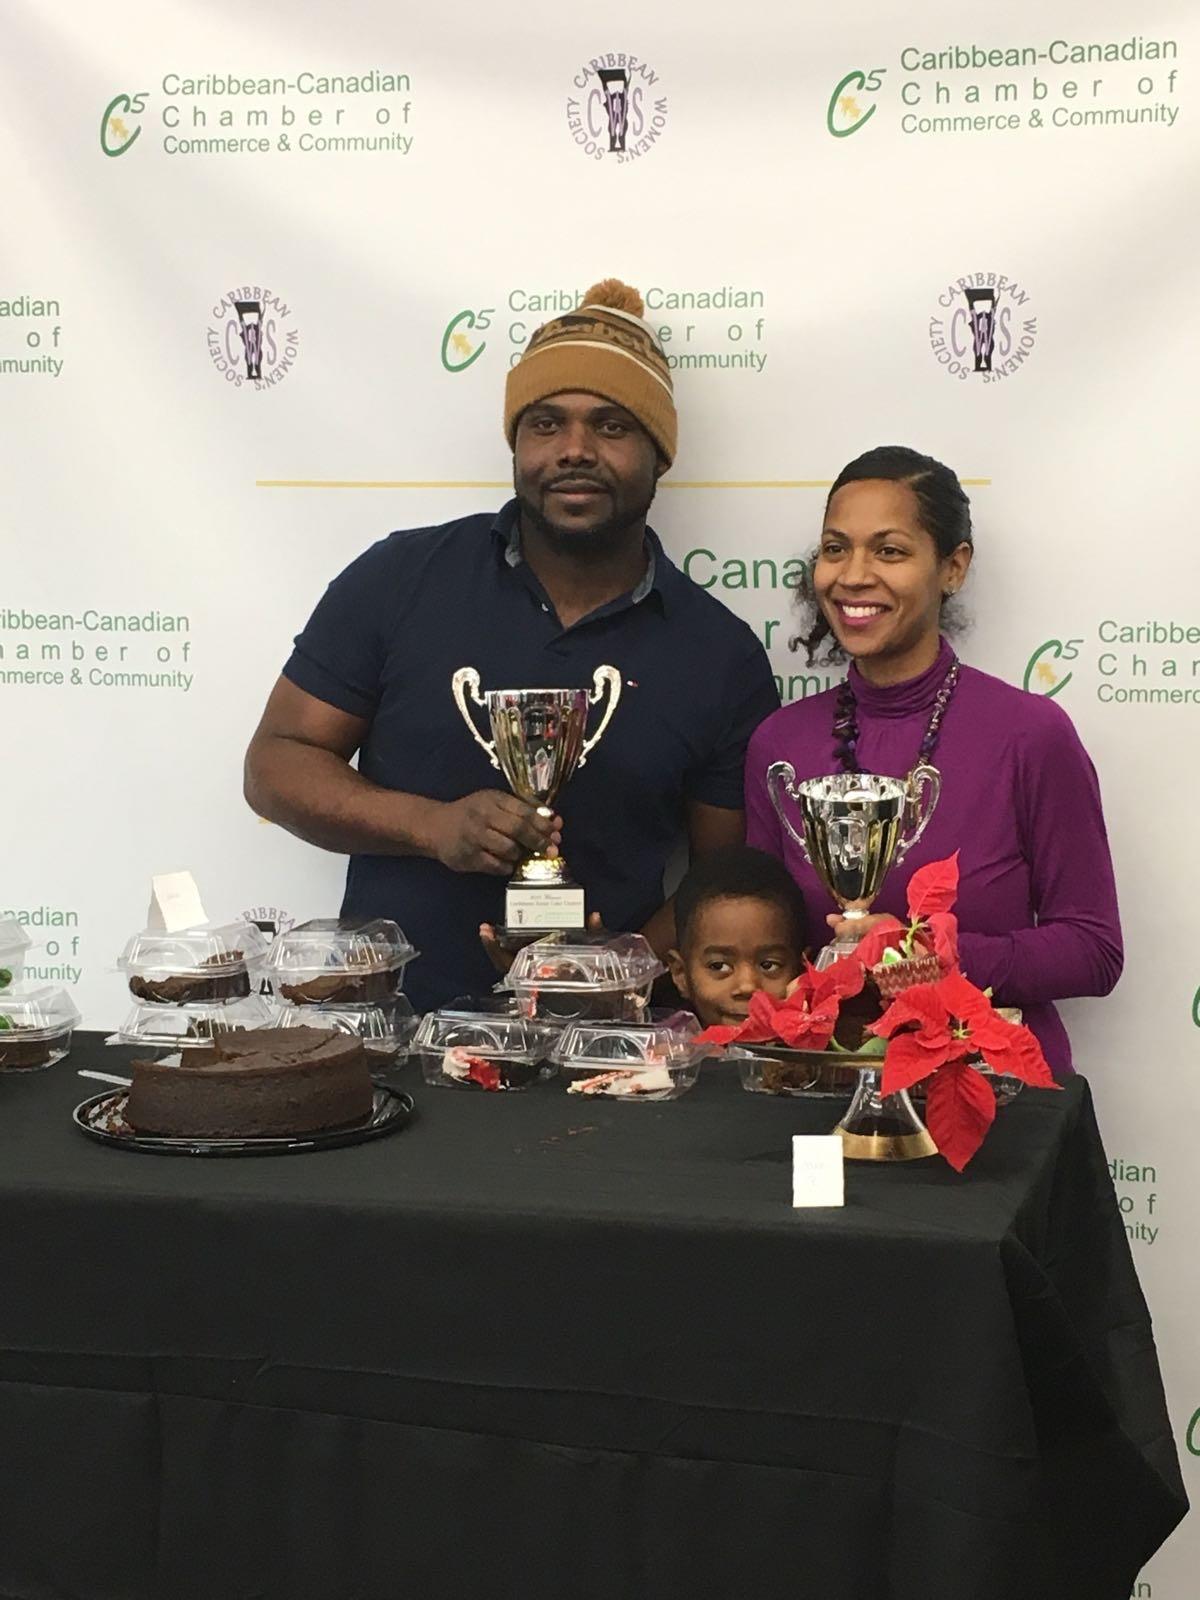 Caribbean Christmas Cake Contest - December 16, 2017